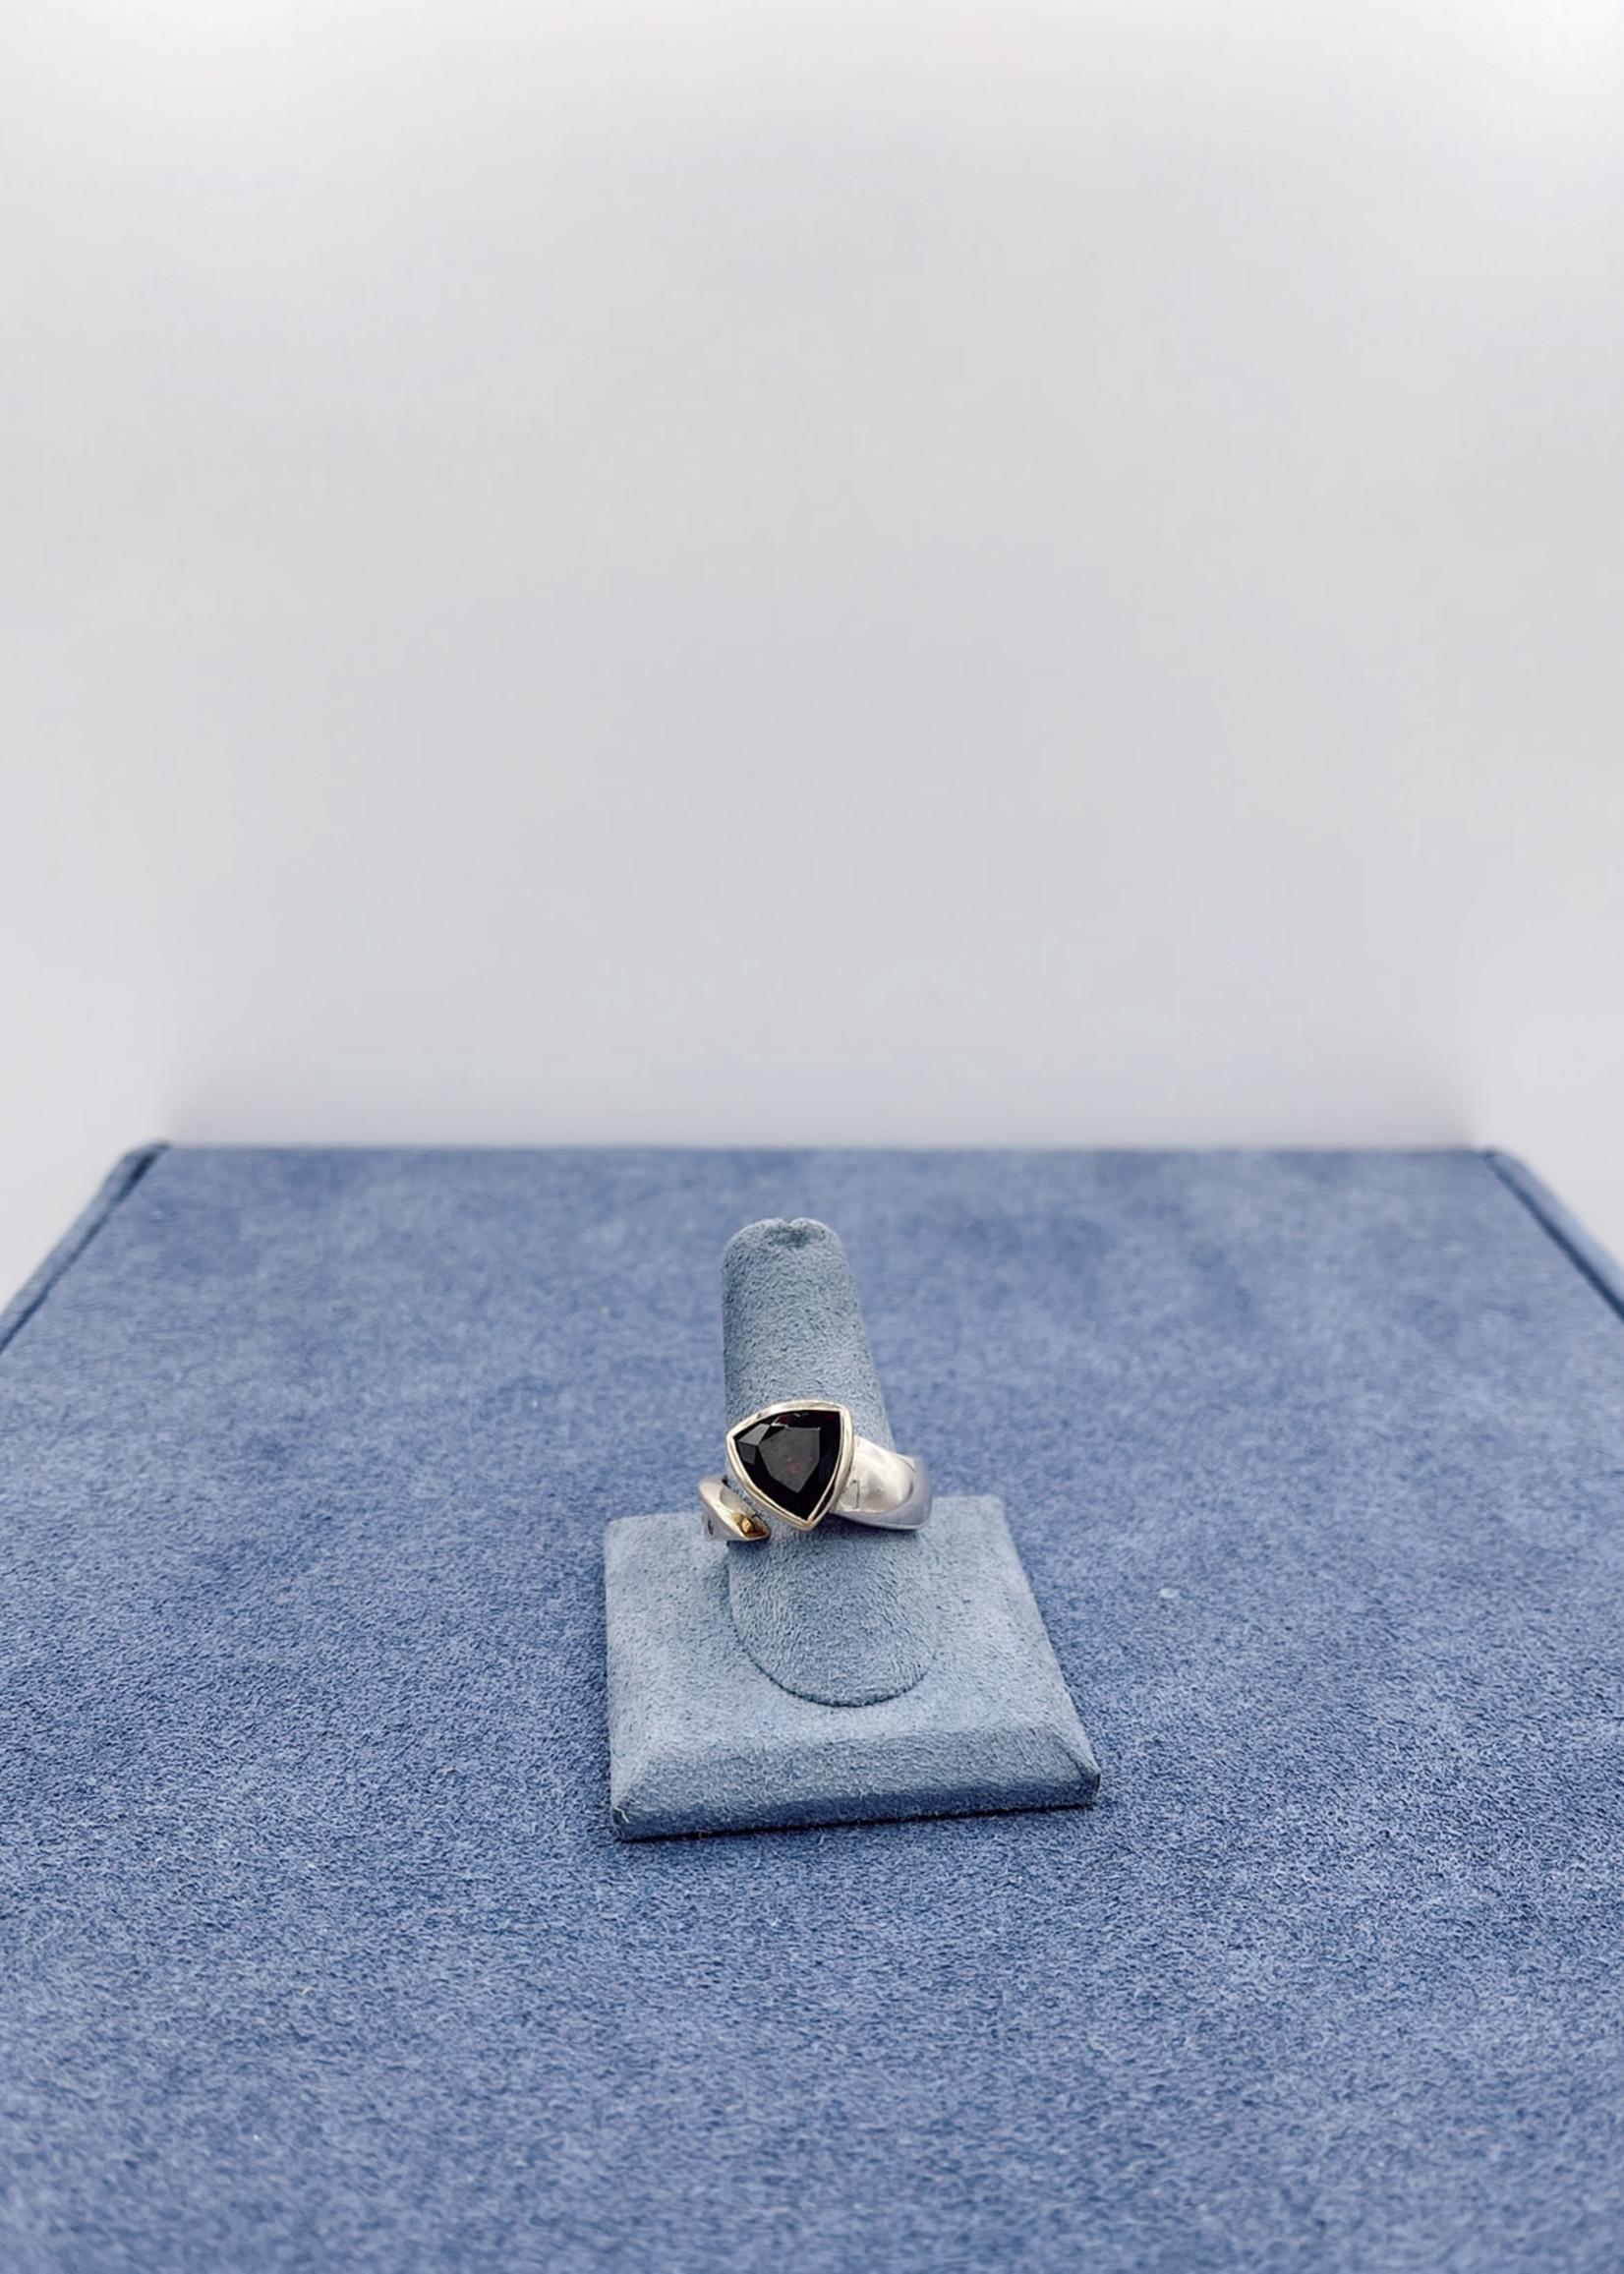 CJ Designs Garnet Split Ring Size 7.50 SS/14ky